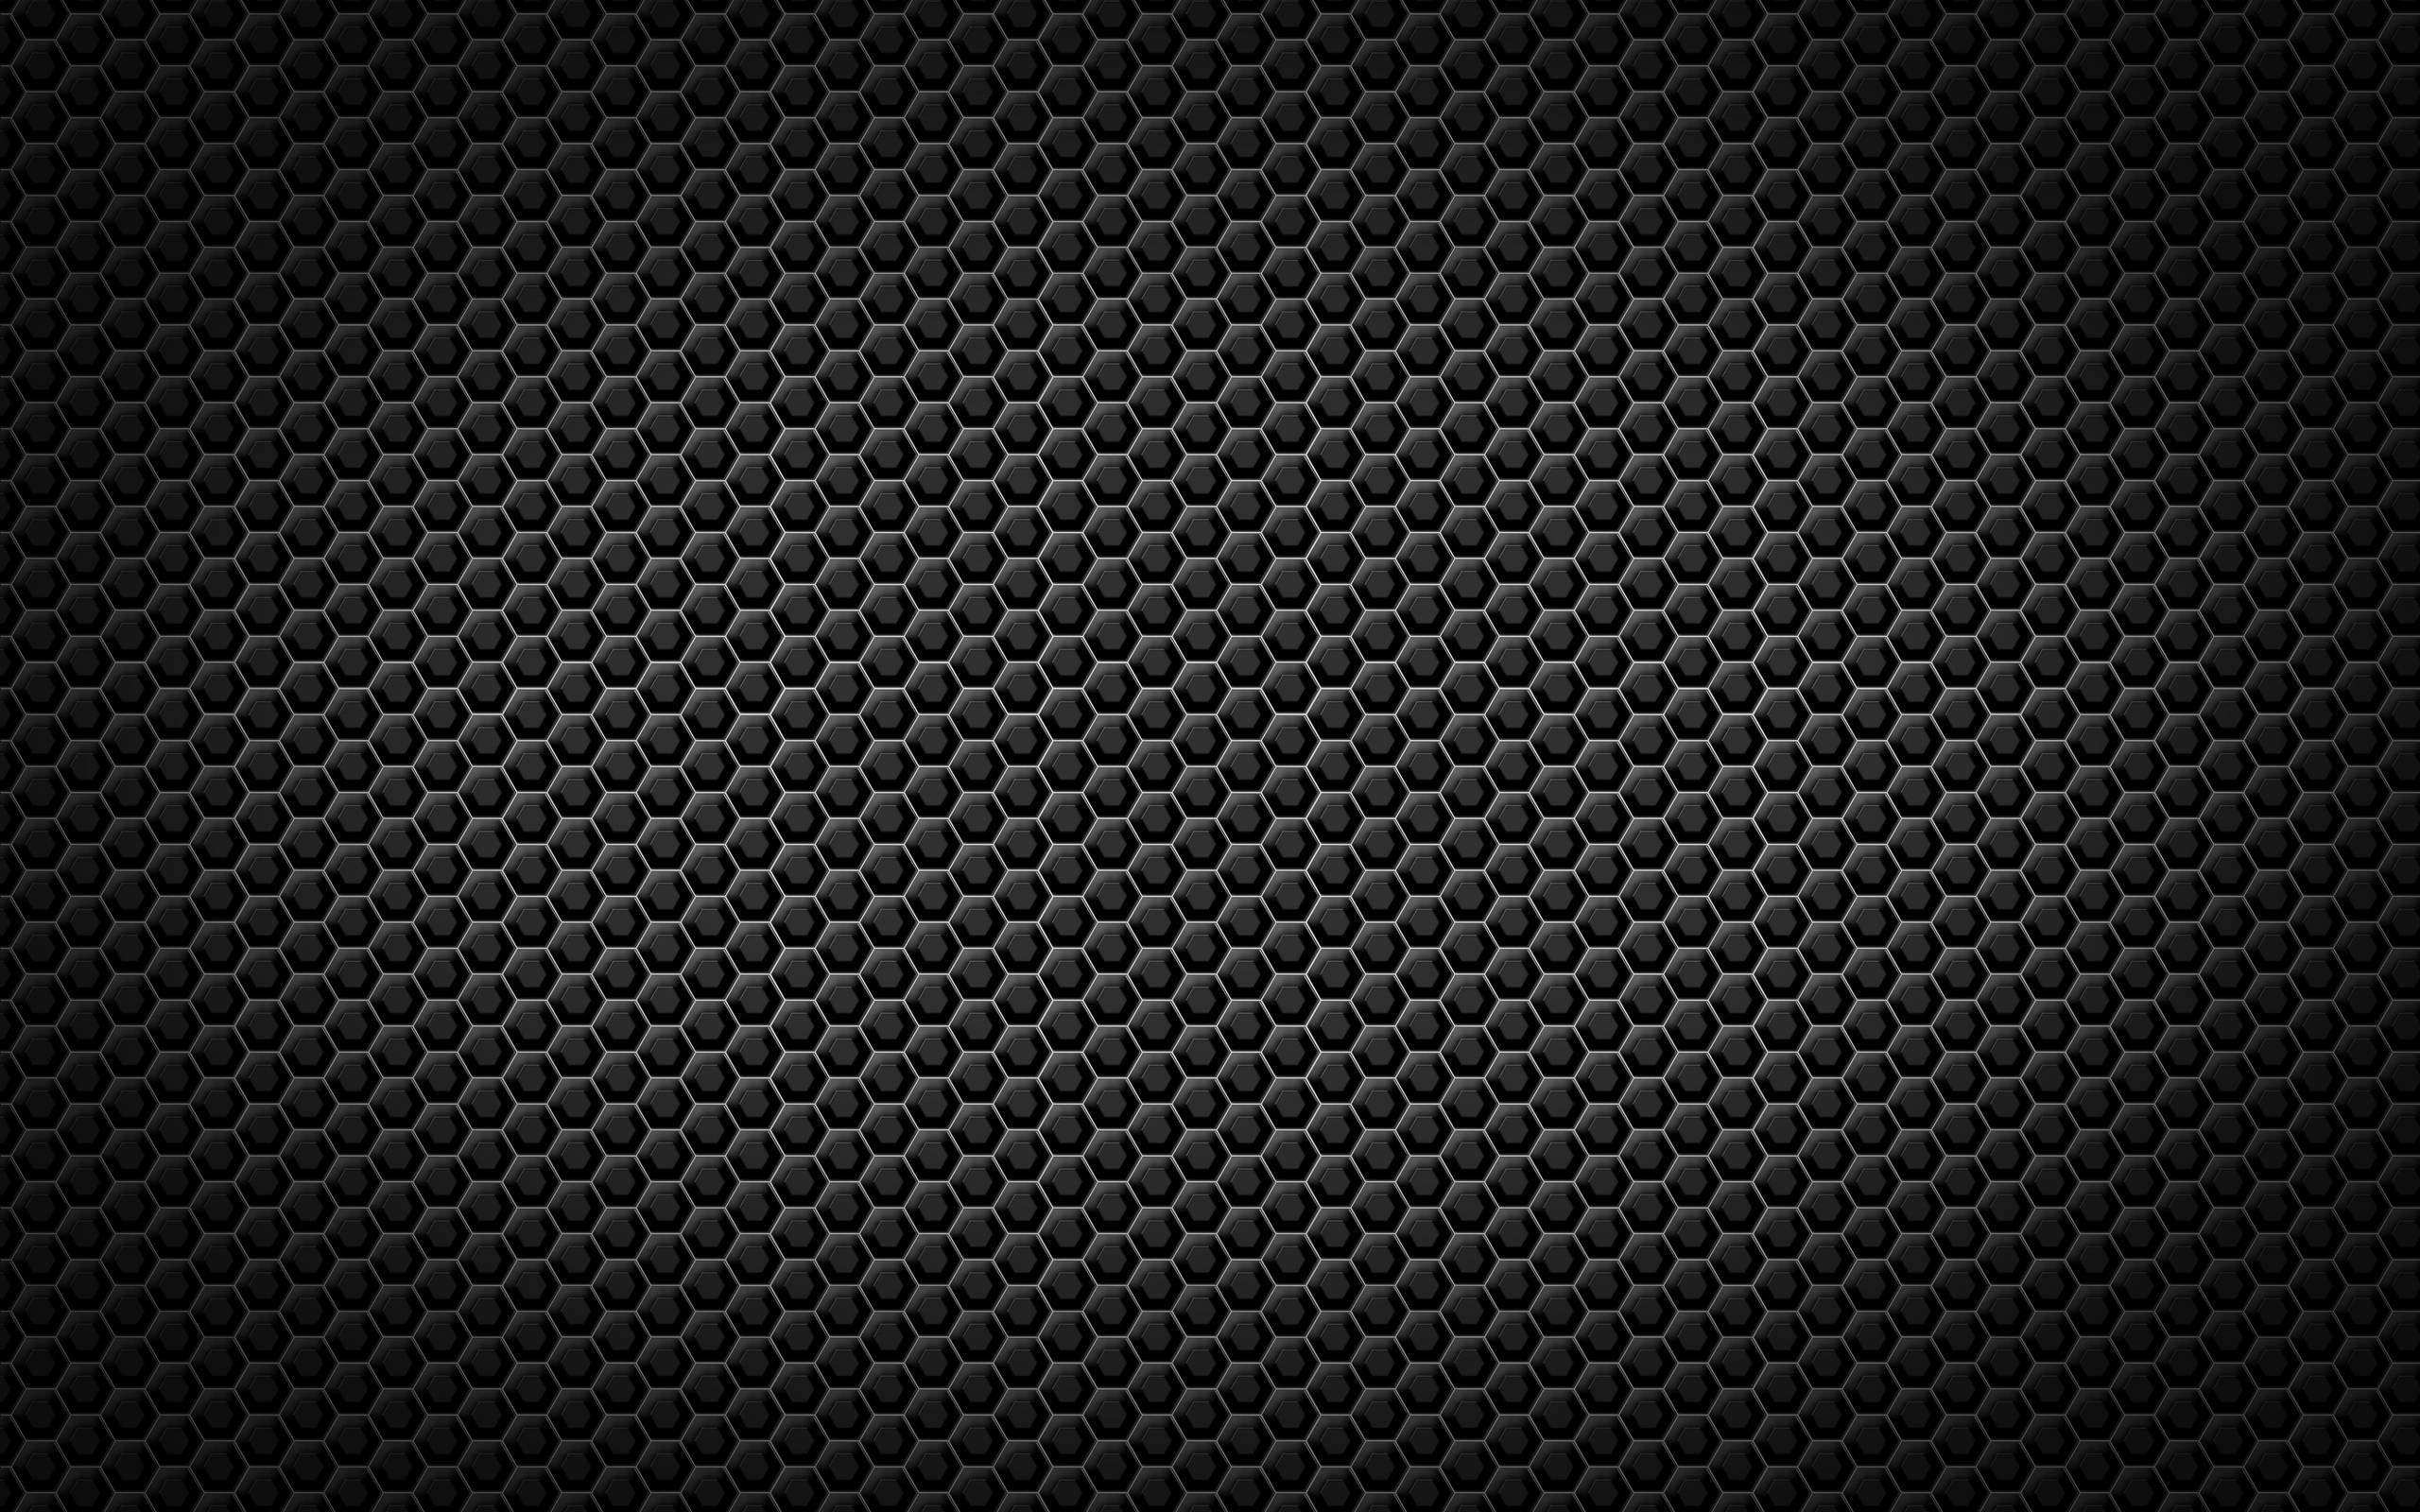 Black Background Images amxxcs.ru Black wallpaper